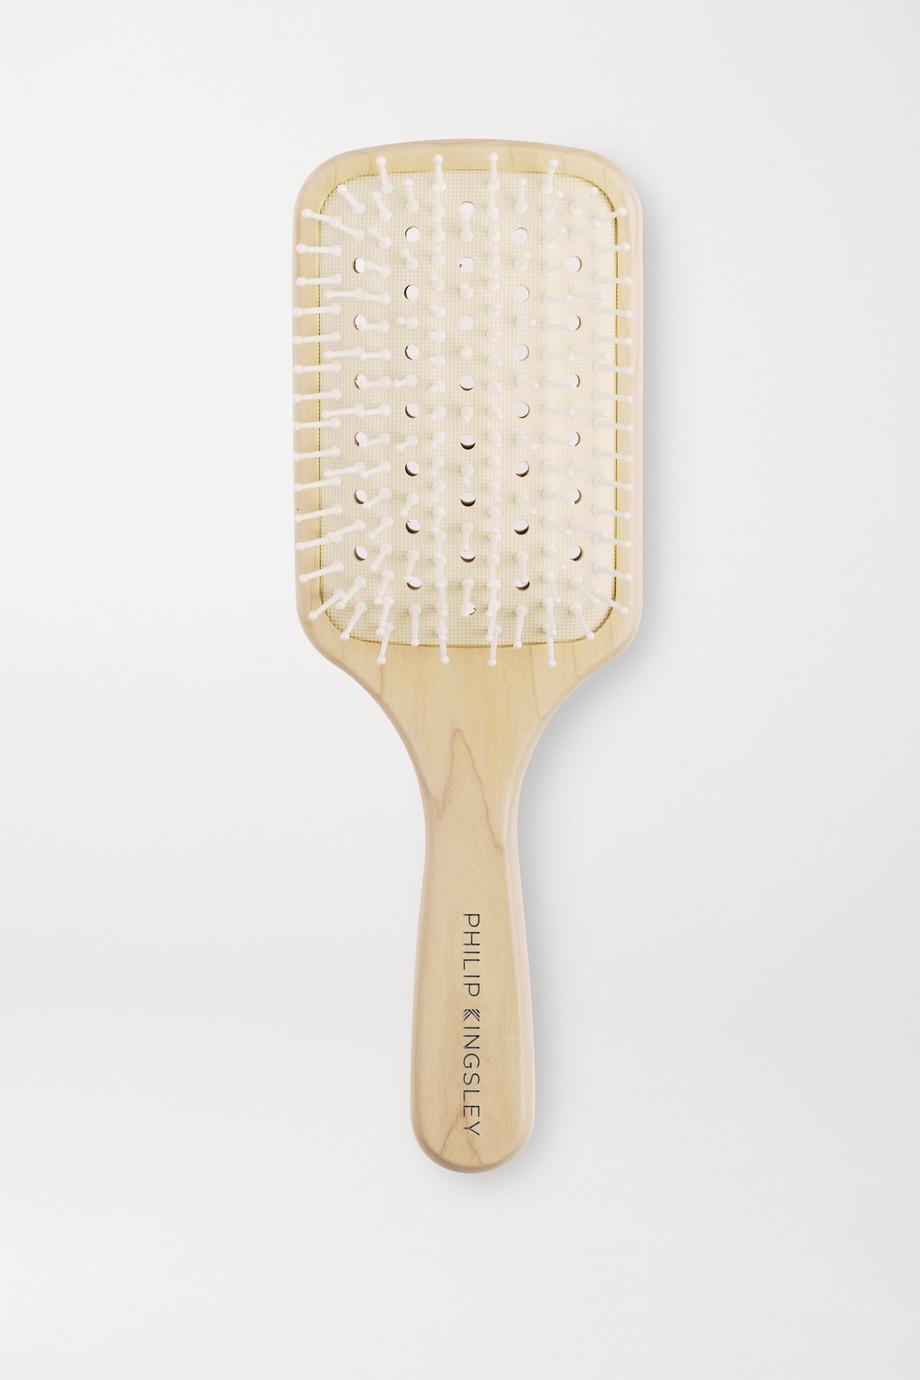 PHILIP KINGSLEY Vented Paddle Hairbrush